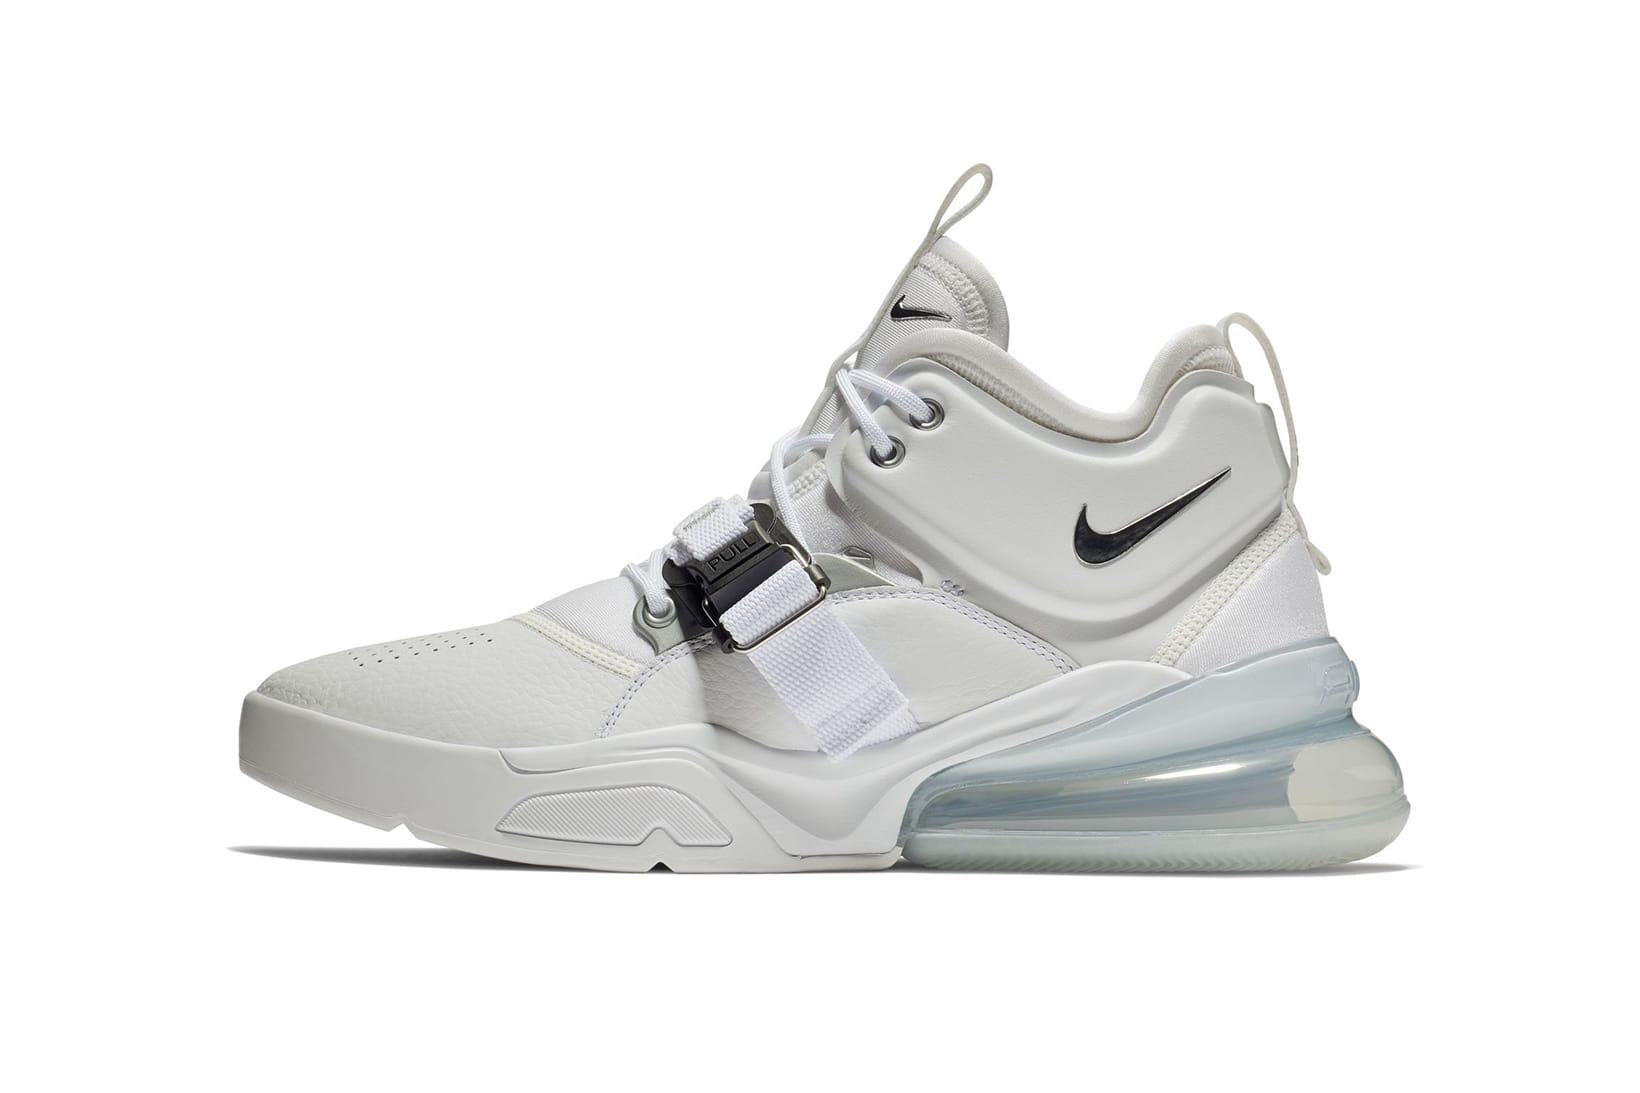 Nike Air Force 270 White/Metallic